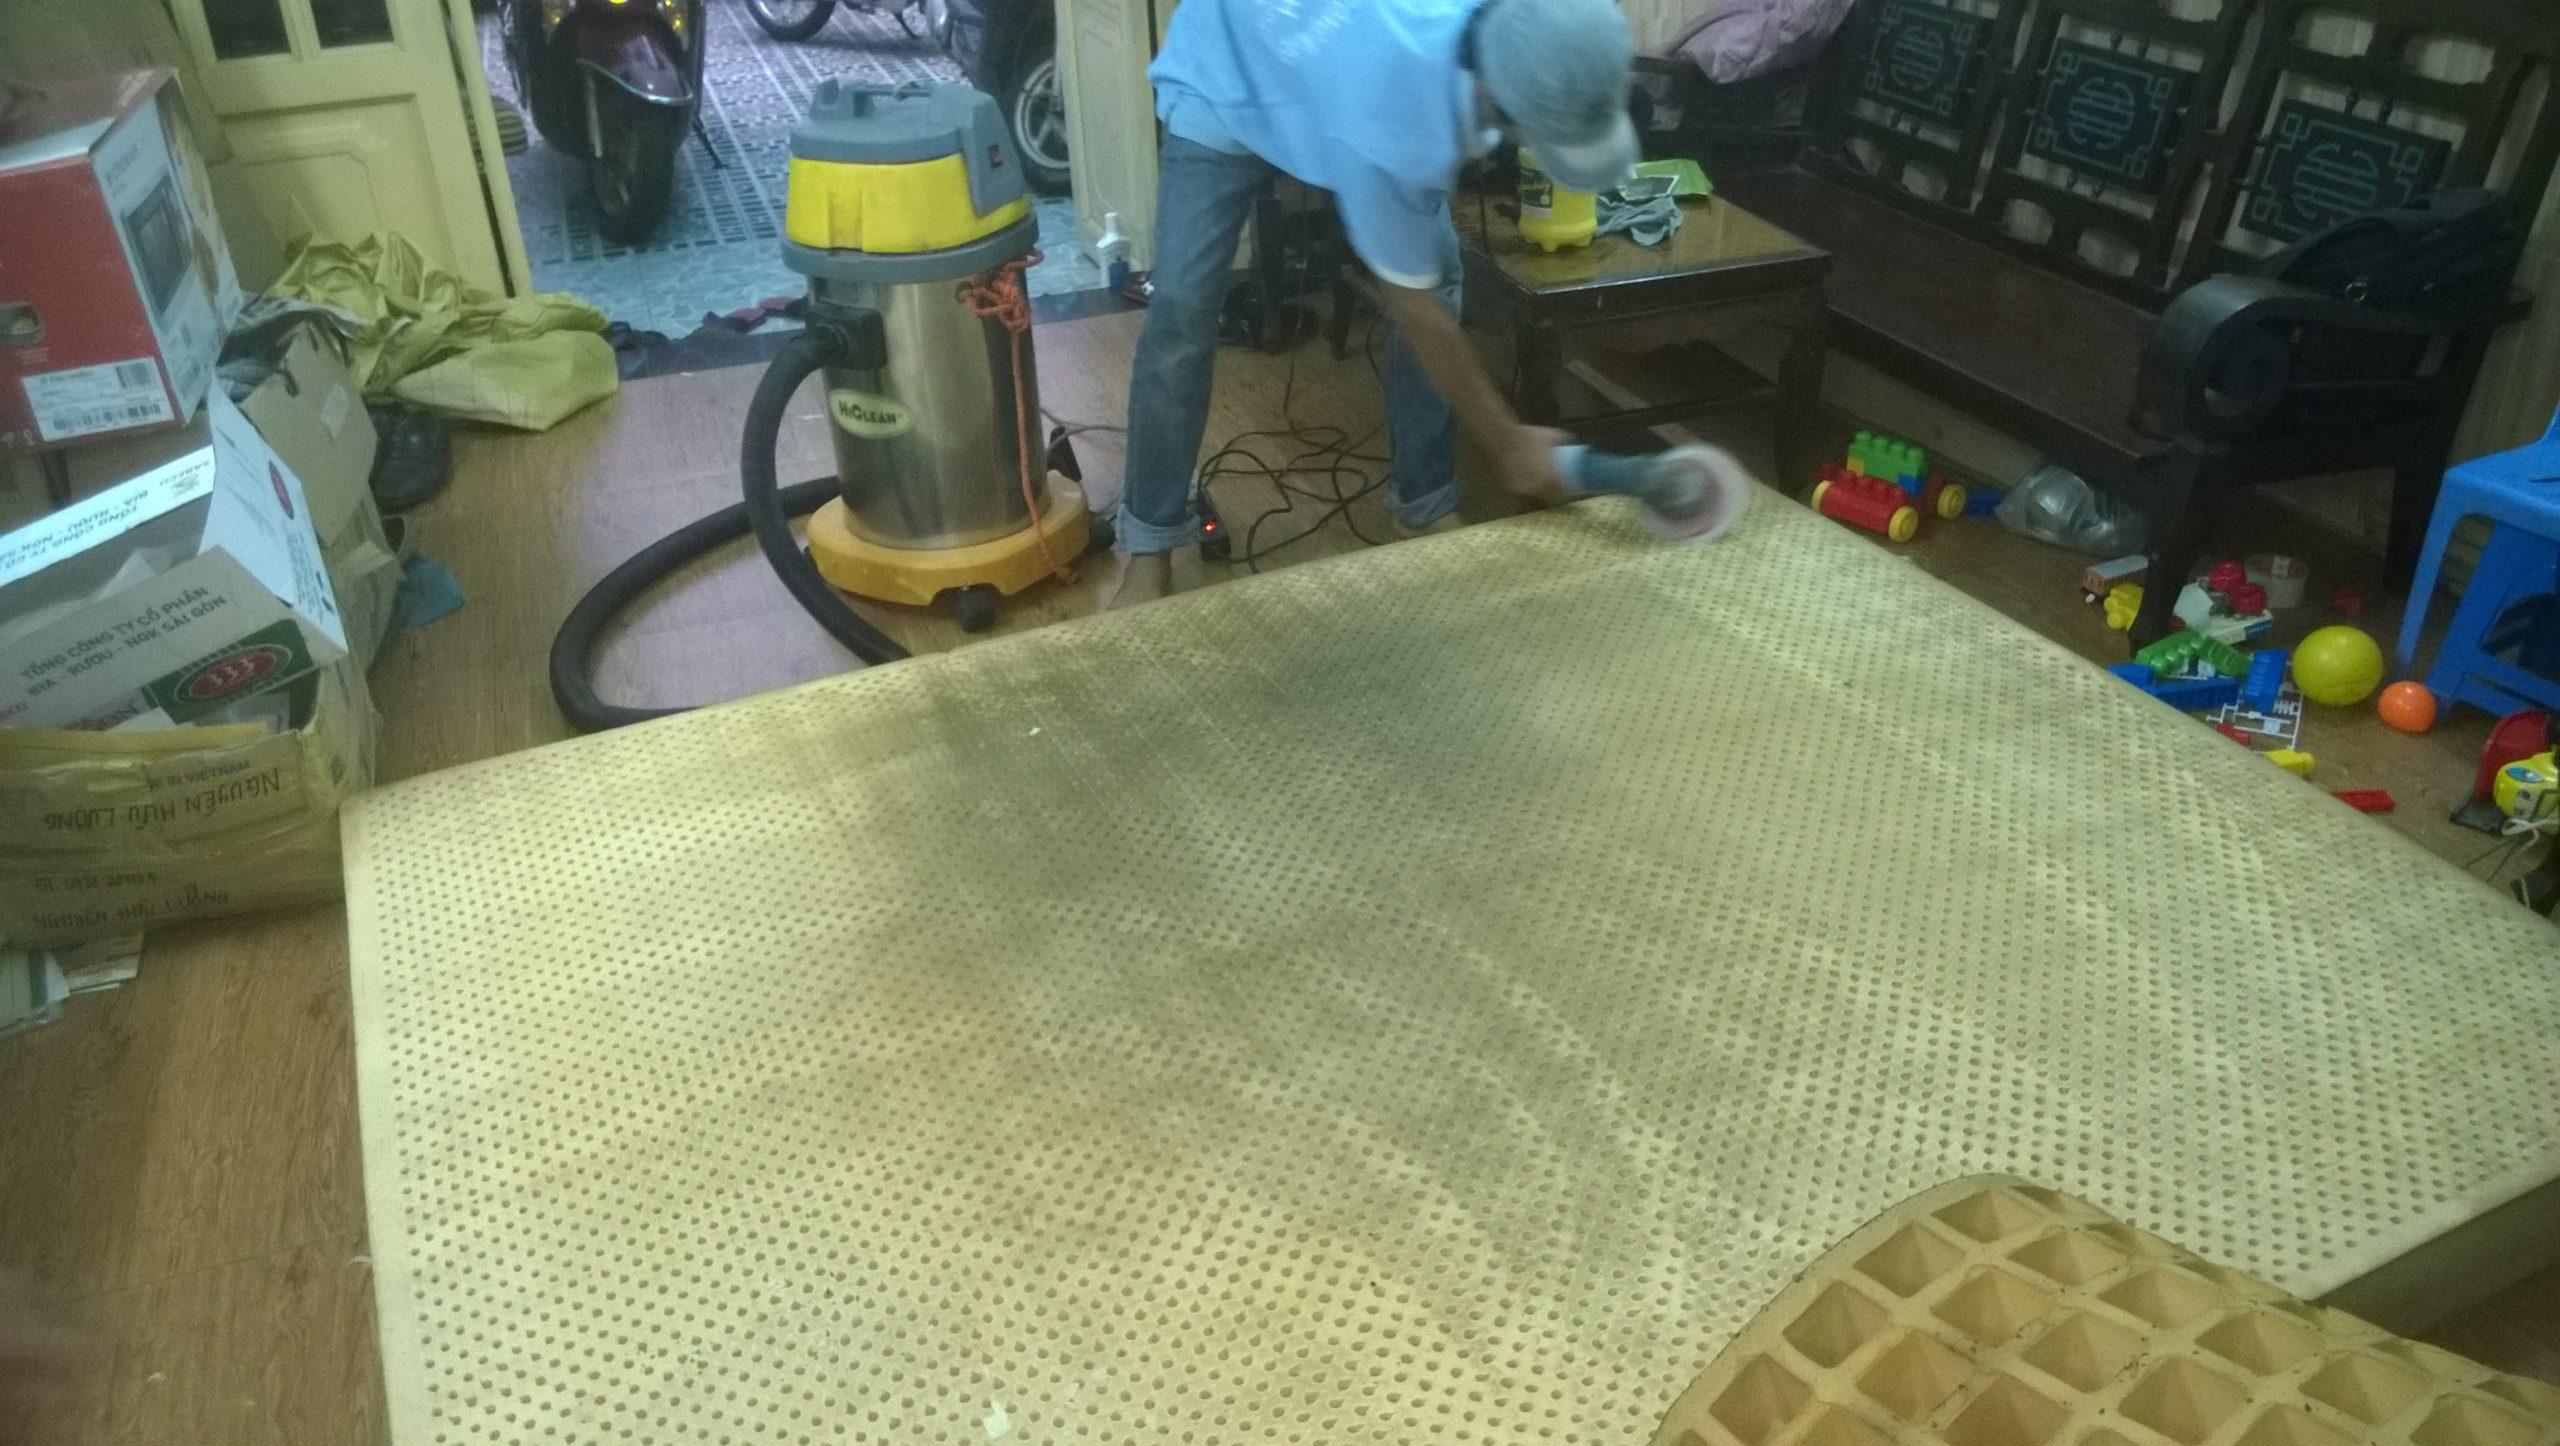 vệ sinh nệm tphcm